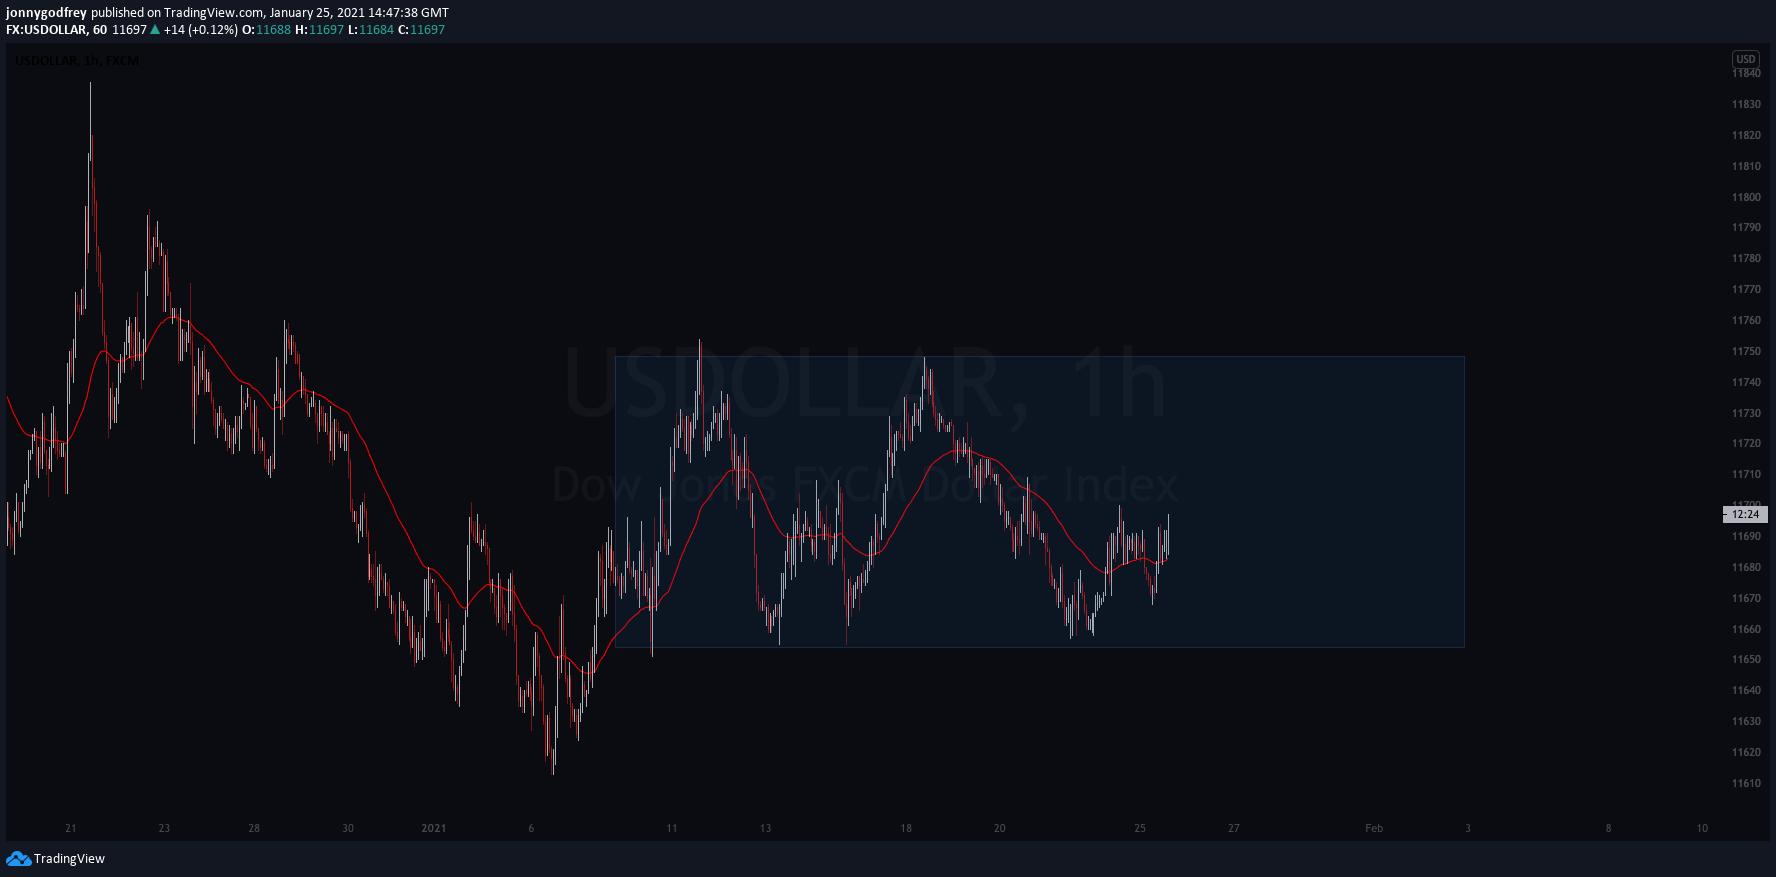 USDOLLAR 1 hour chart